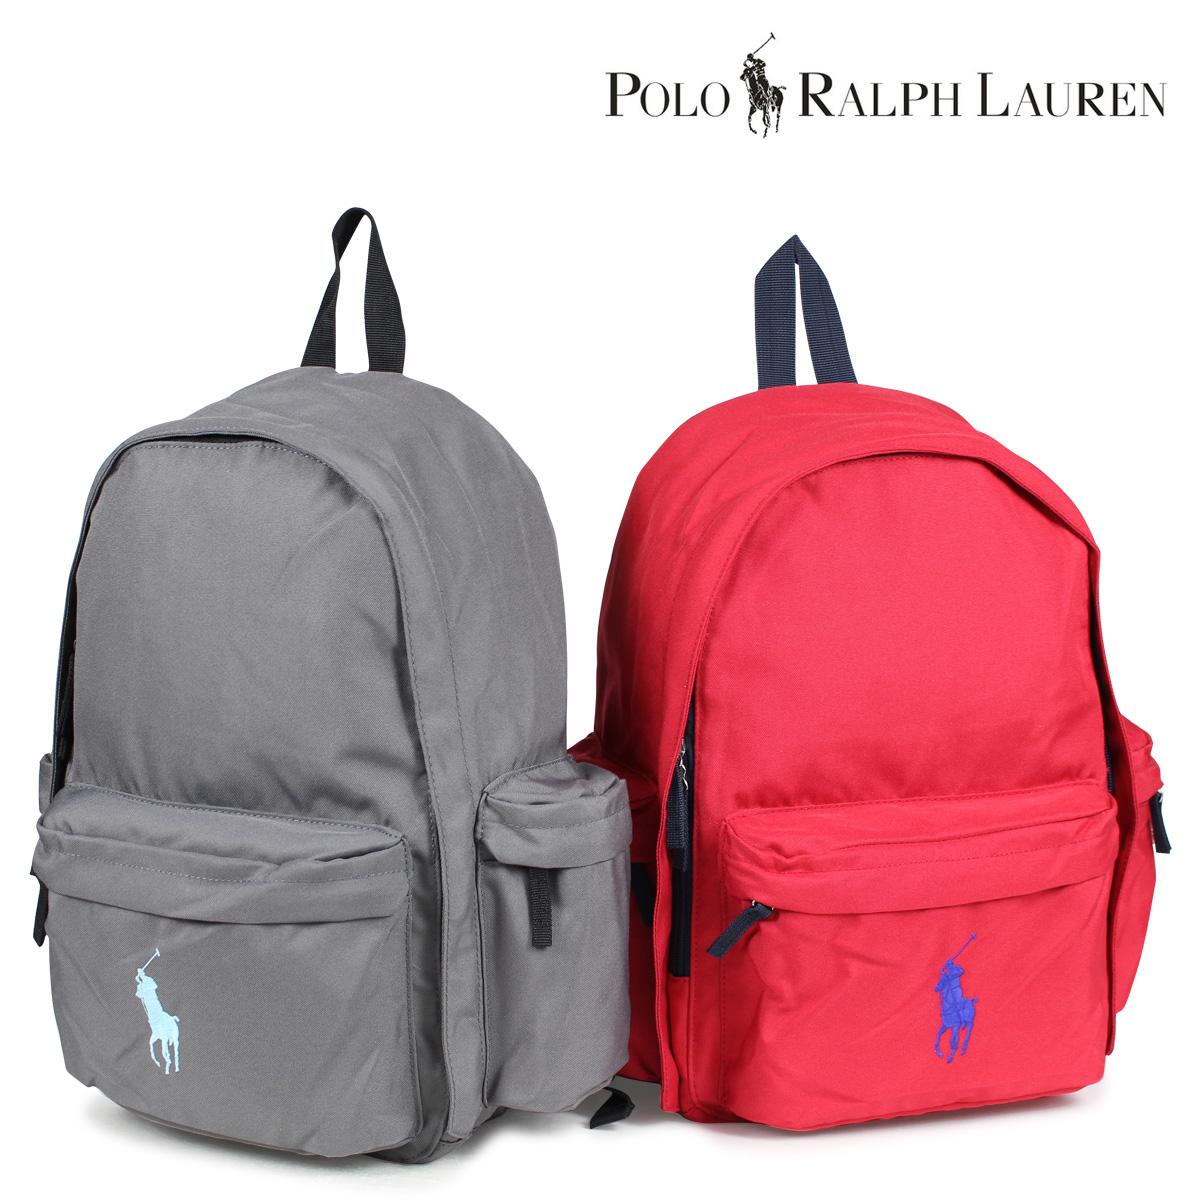 7c57b3155c93 Sugar Online Shop  POLO RALPH LAUREN bag rucksack polo Ralph Lauren ...